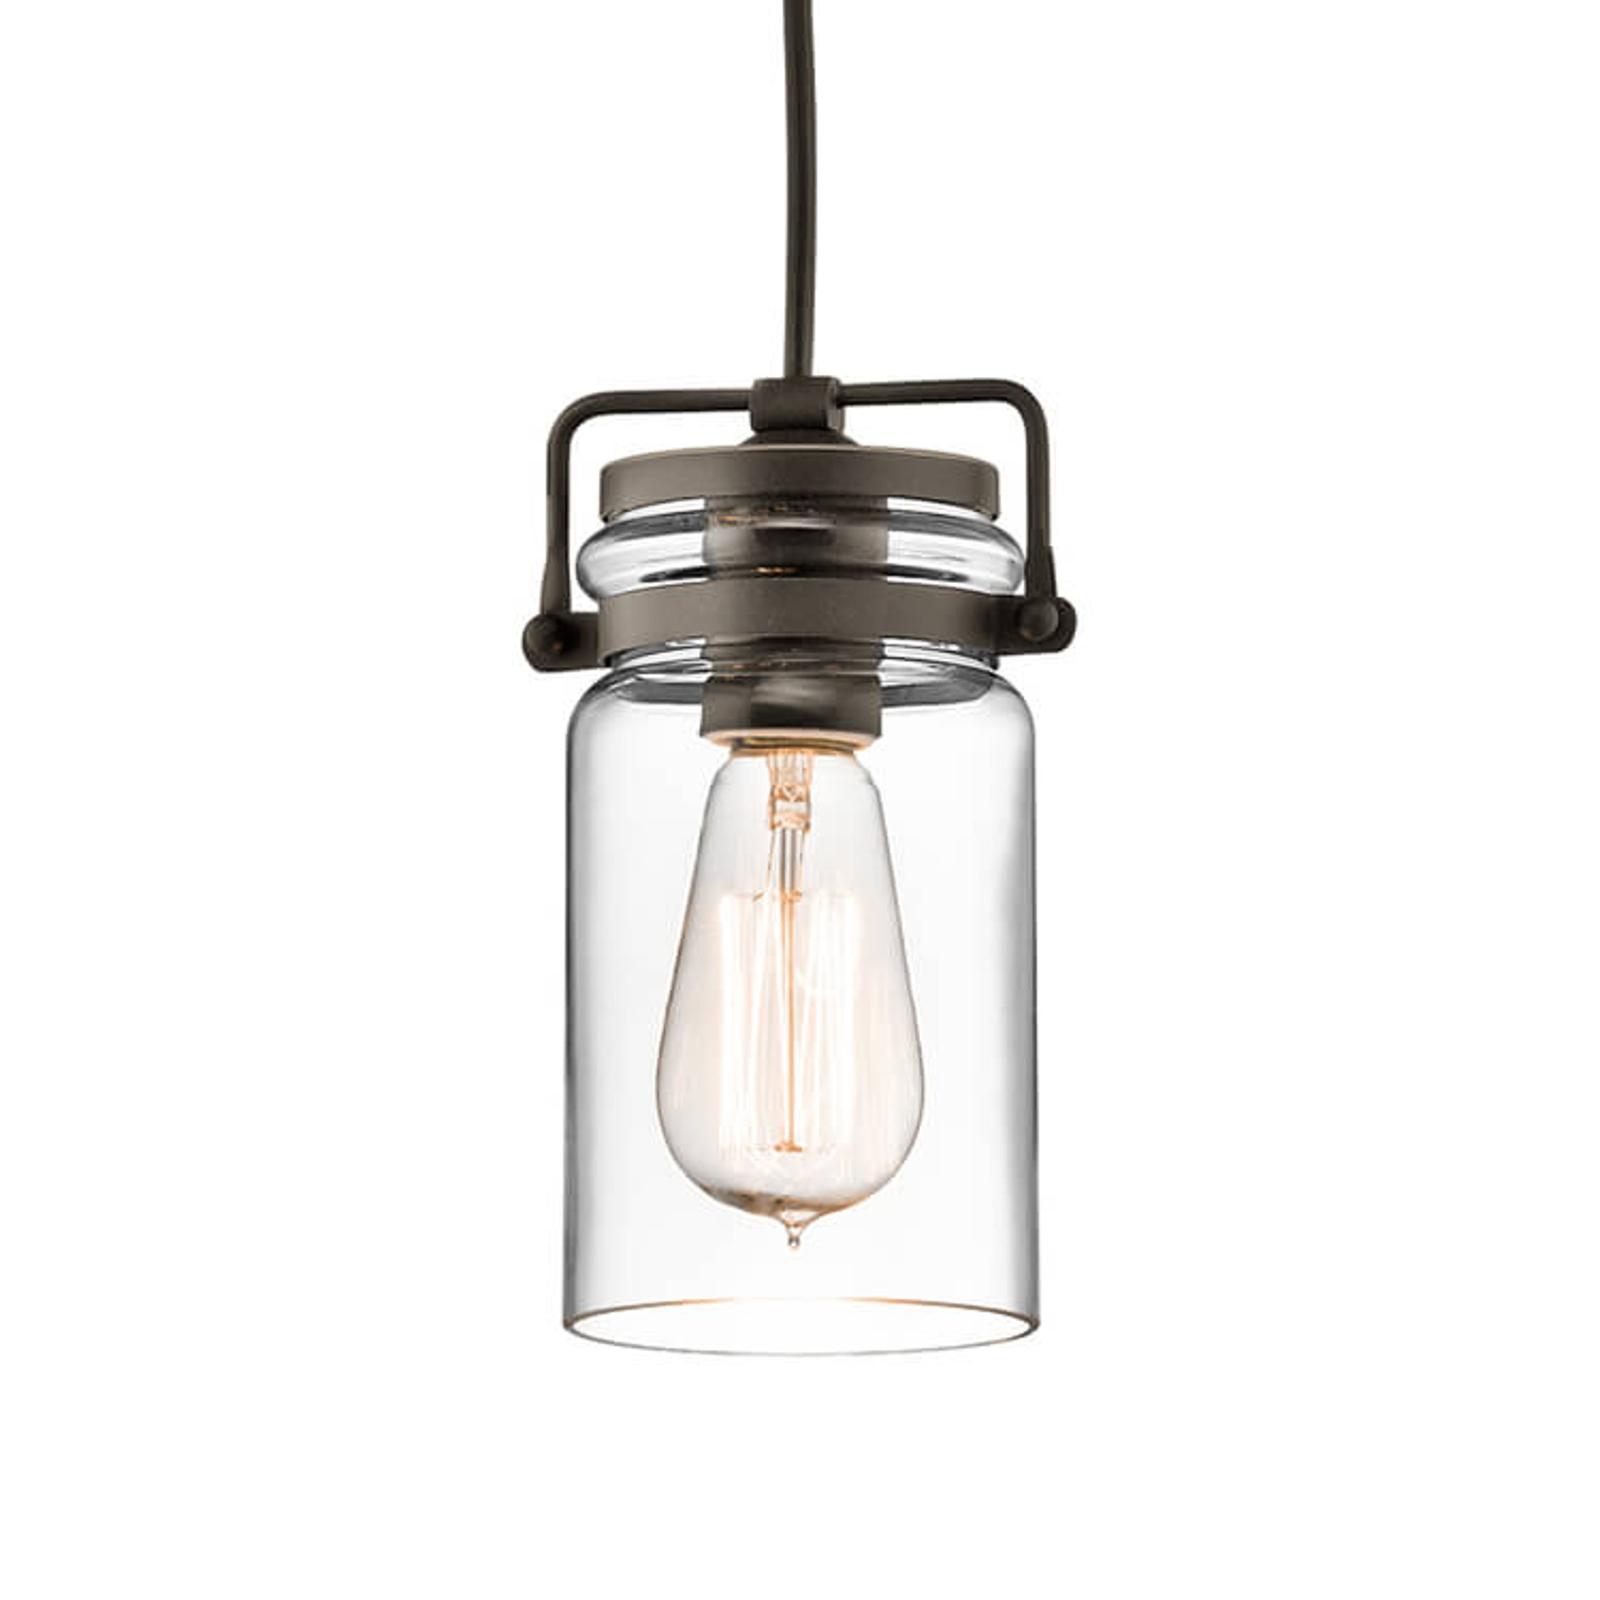 Glas-hanglamp Brinley met één lampje